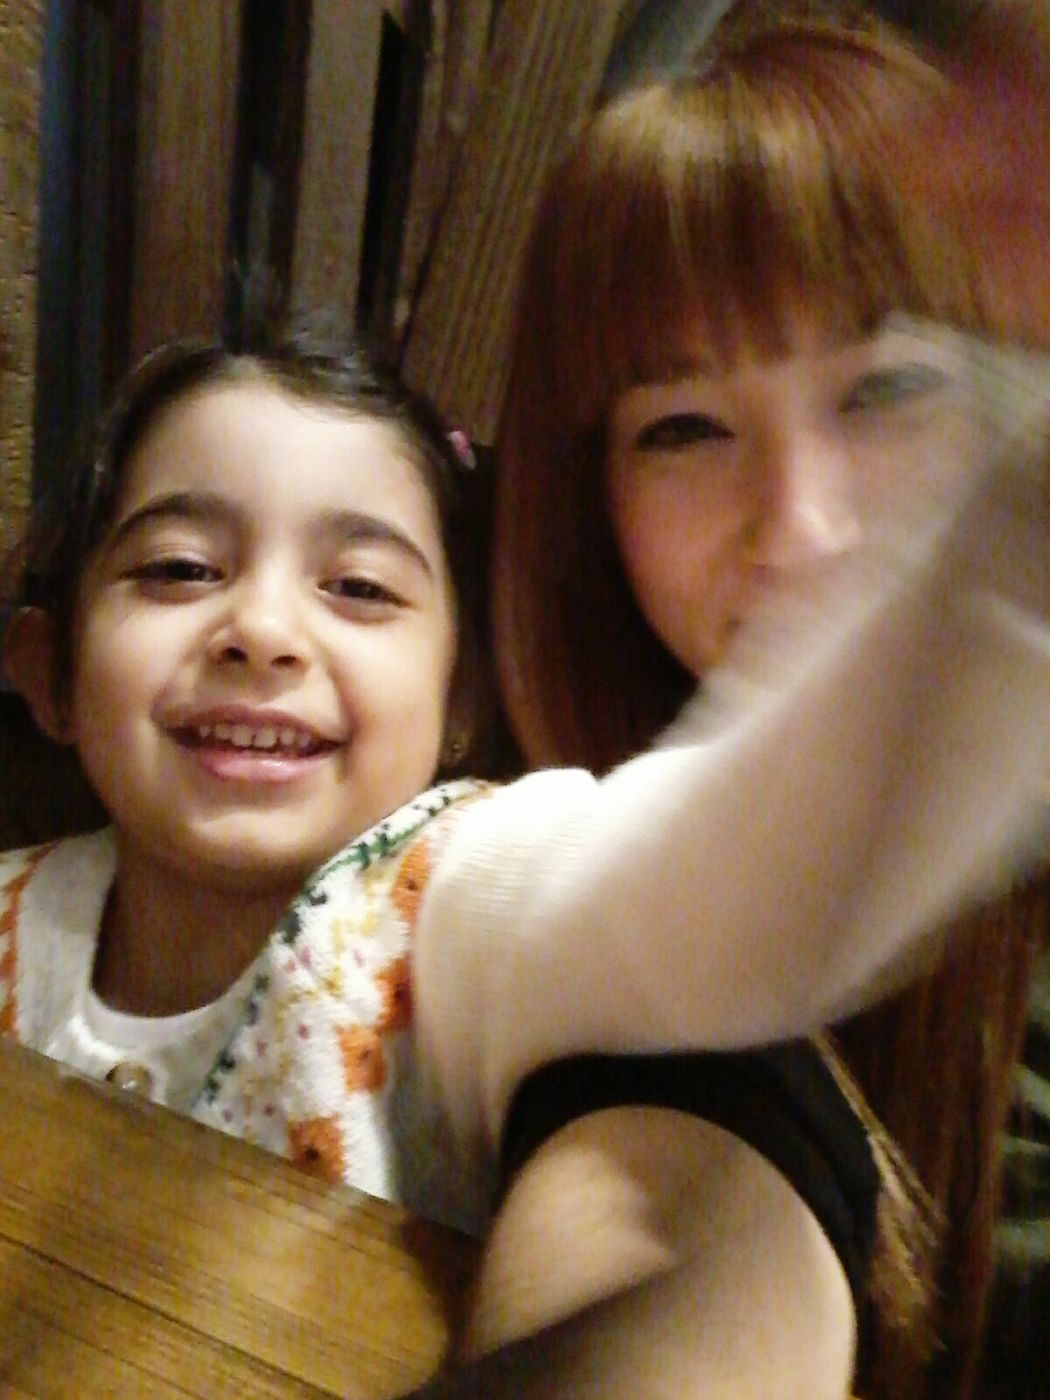 Sweet Cute♡ Baby Sweetcurse Taking Photos Eating Burgers Dinner Goodmood